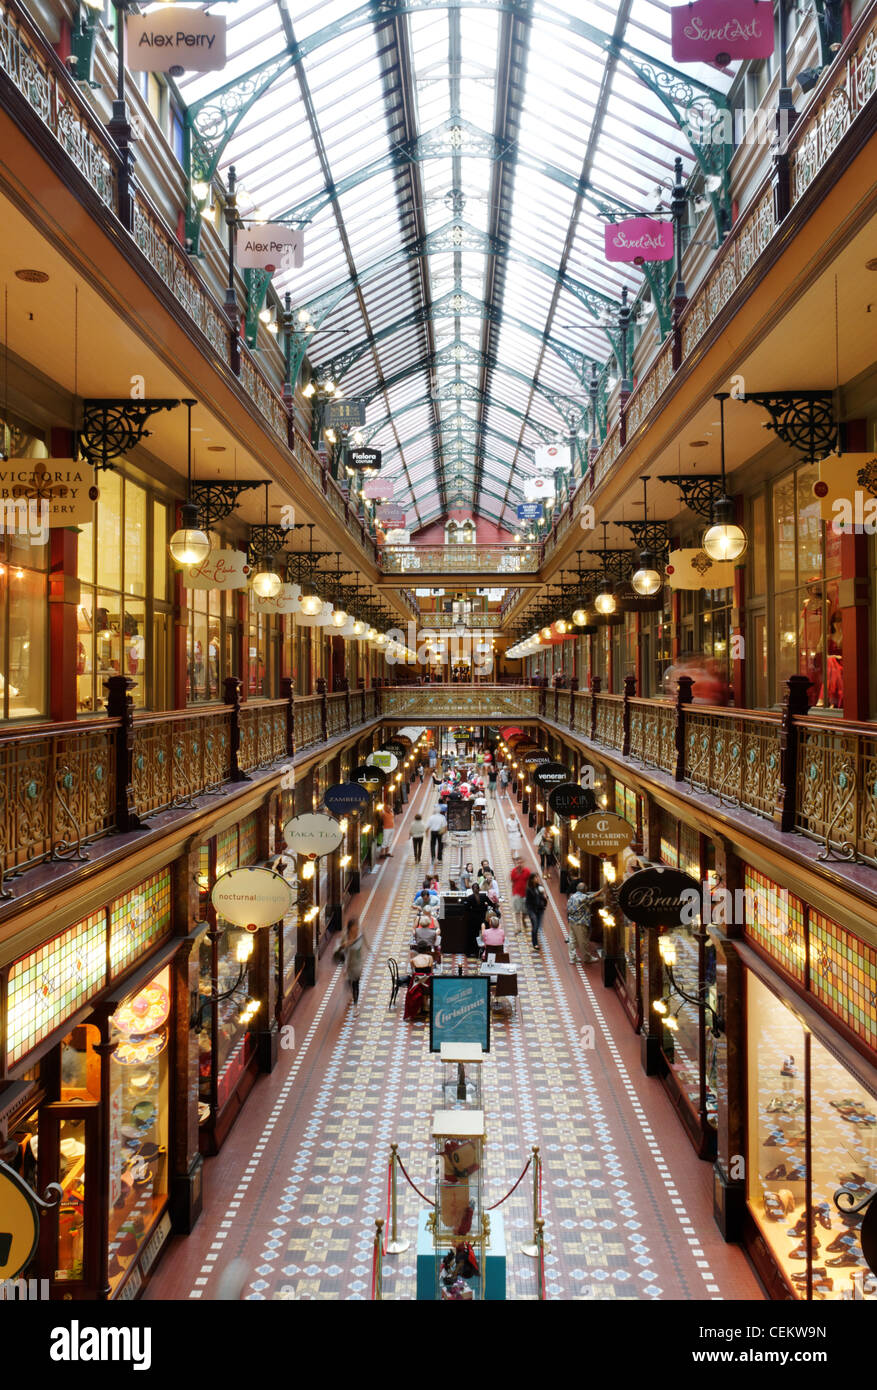 Online sex store australia in Sydney